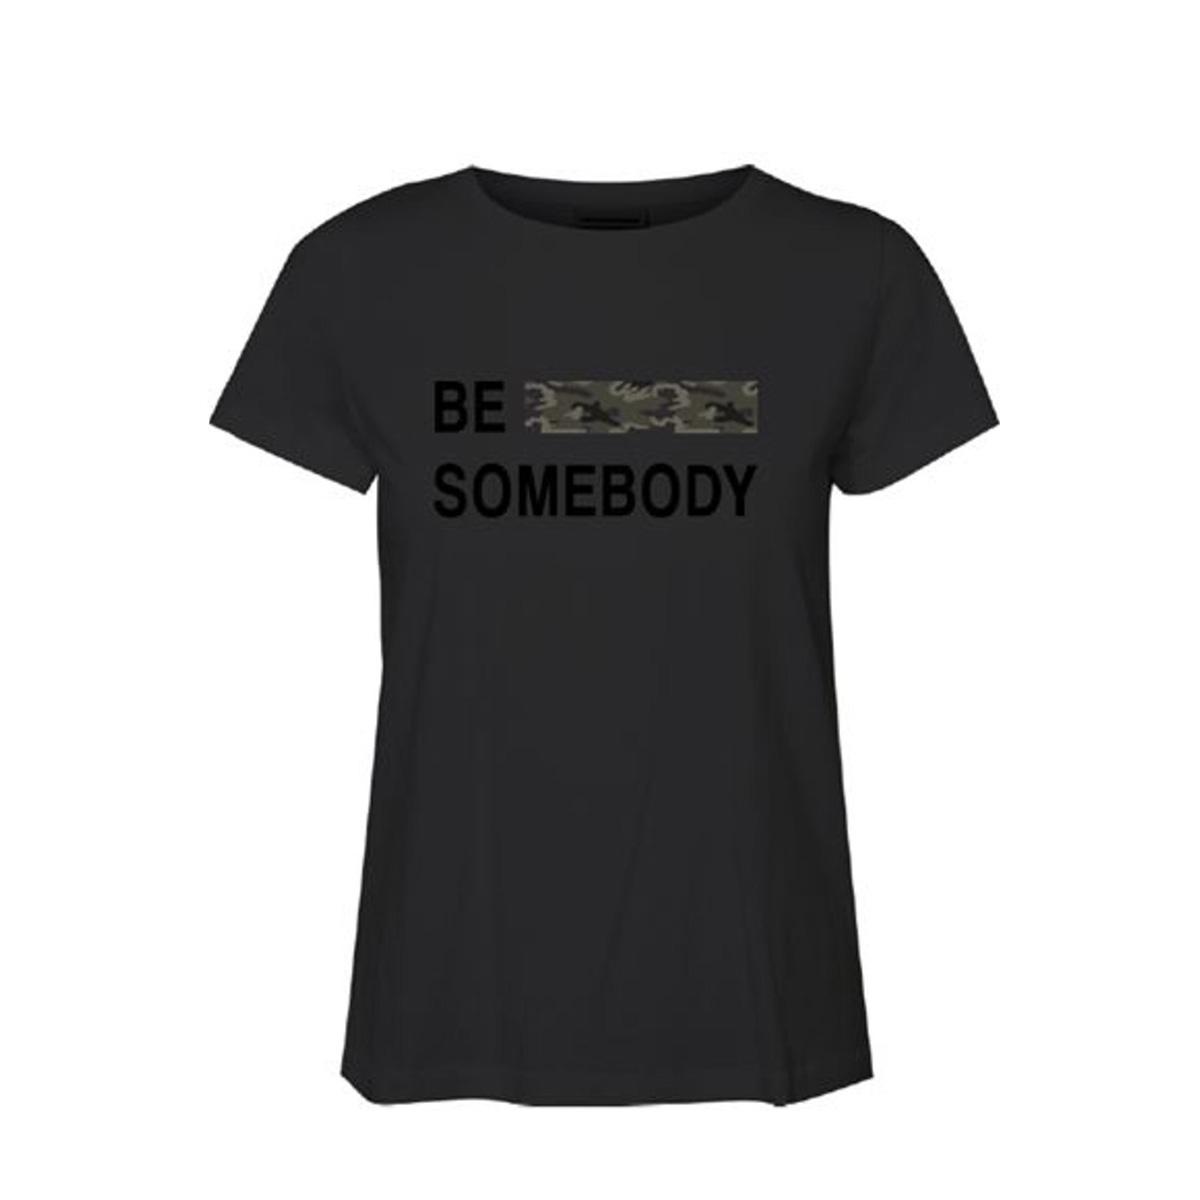 vmbe camo francis ss top box ga  jr 10219522 vero moda t-shirt black/be somebod